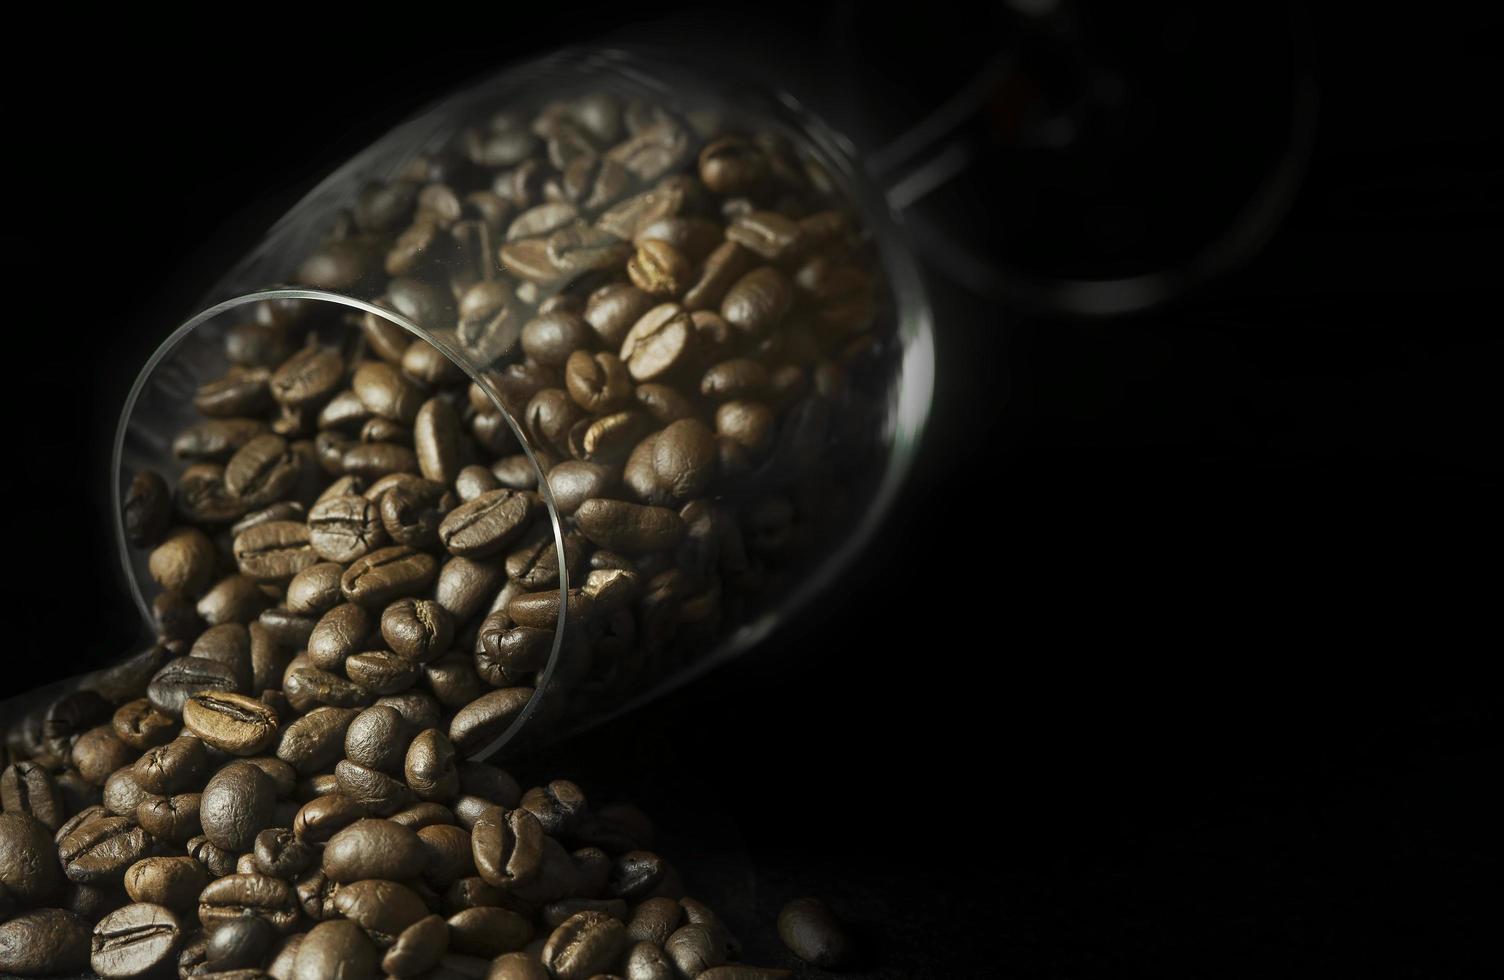 granos de café en copa de vino sobre fondo negro foto